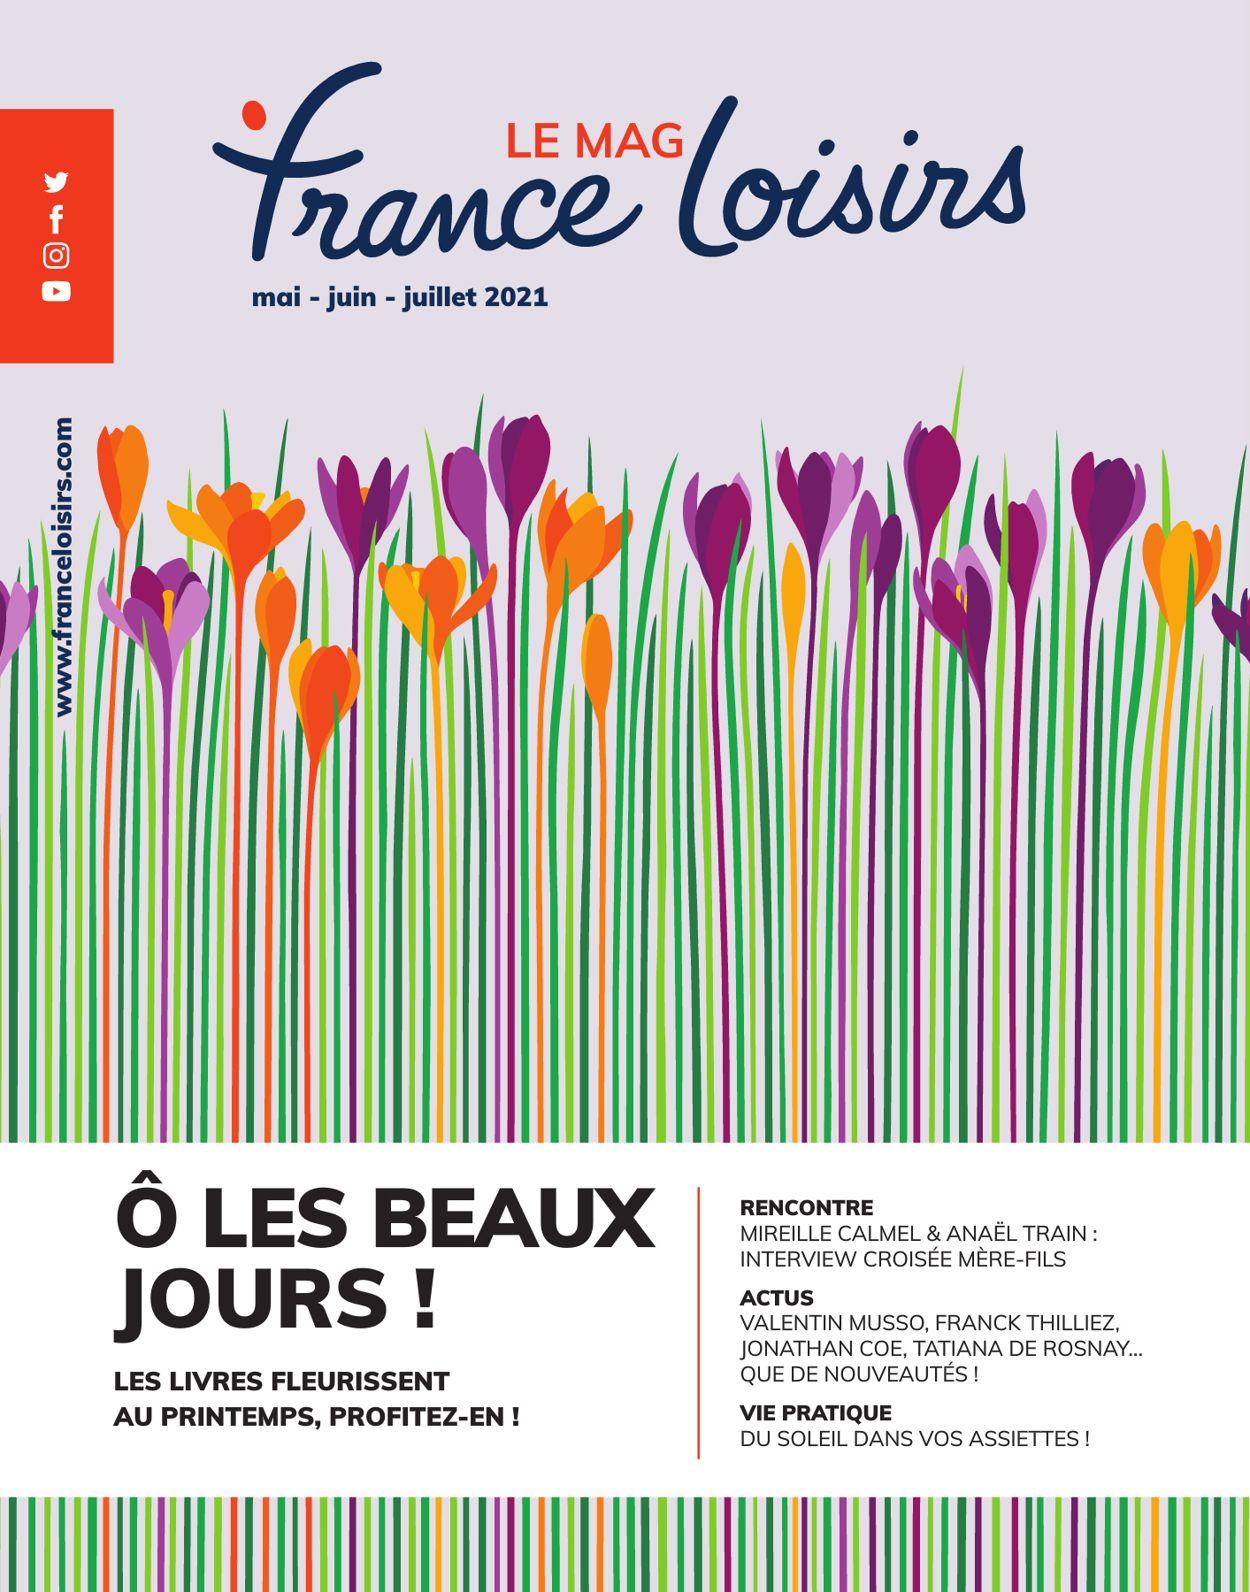 France Loisirs Catalogue - 01.05-31.07.2021